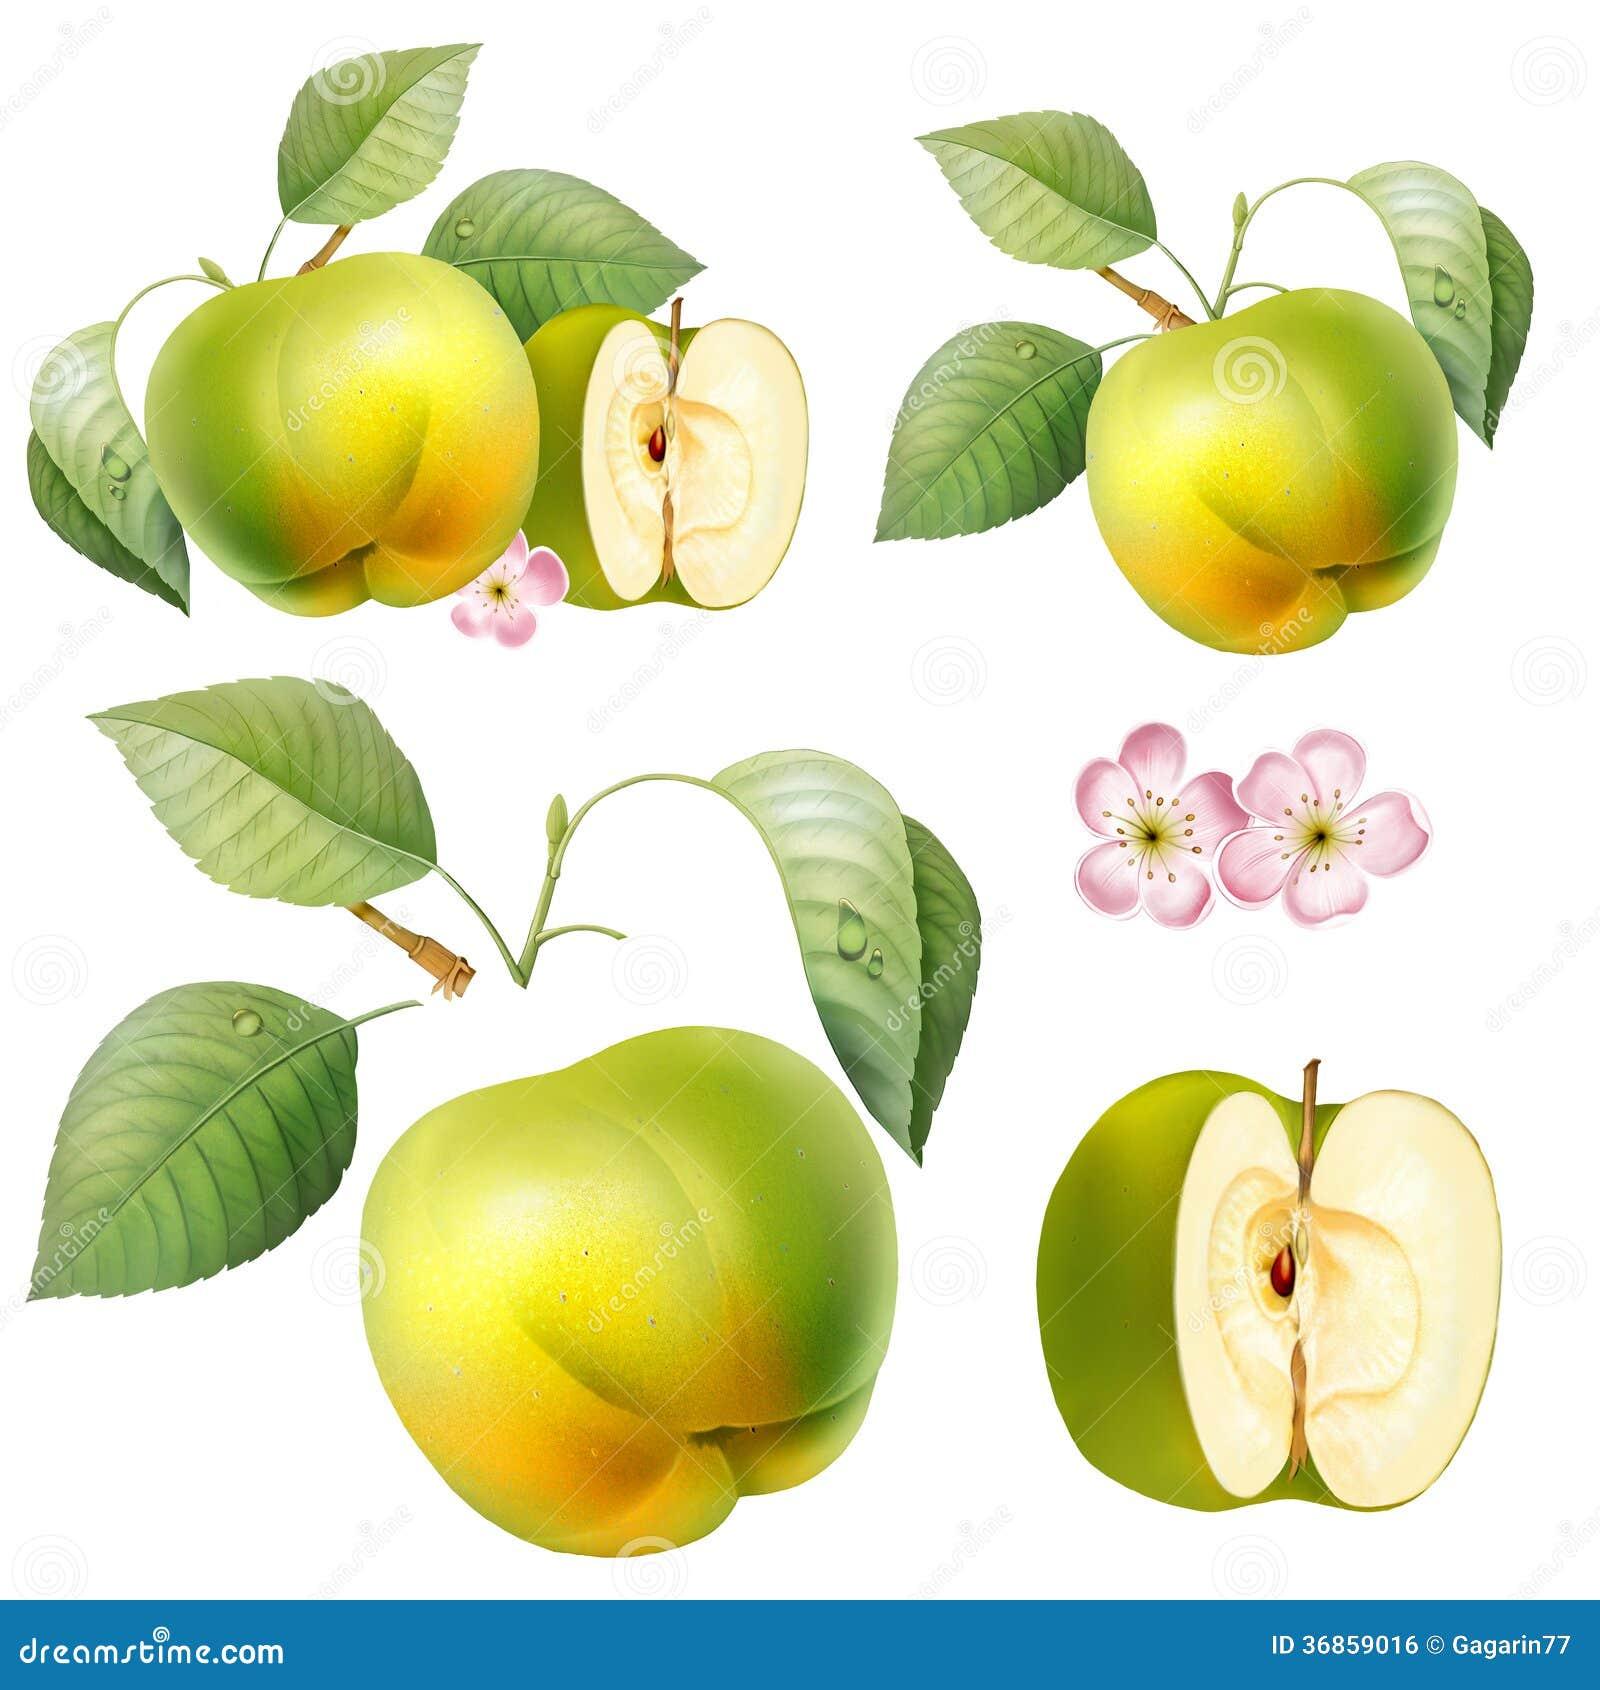 green apple fruit drawing. royalty-free stock photo. download food, fruit, apple, drawing green apple fruit